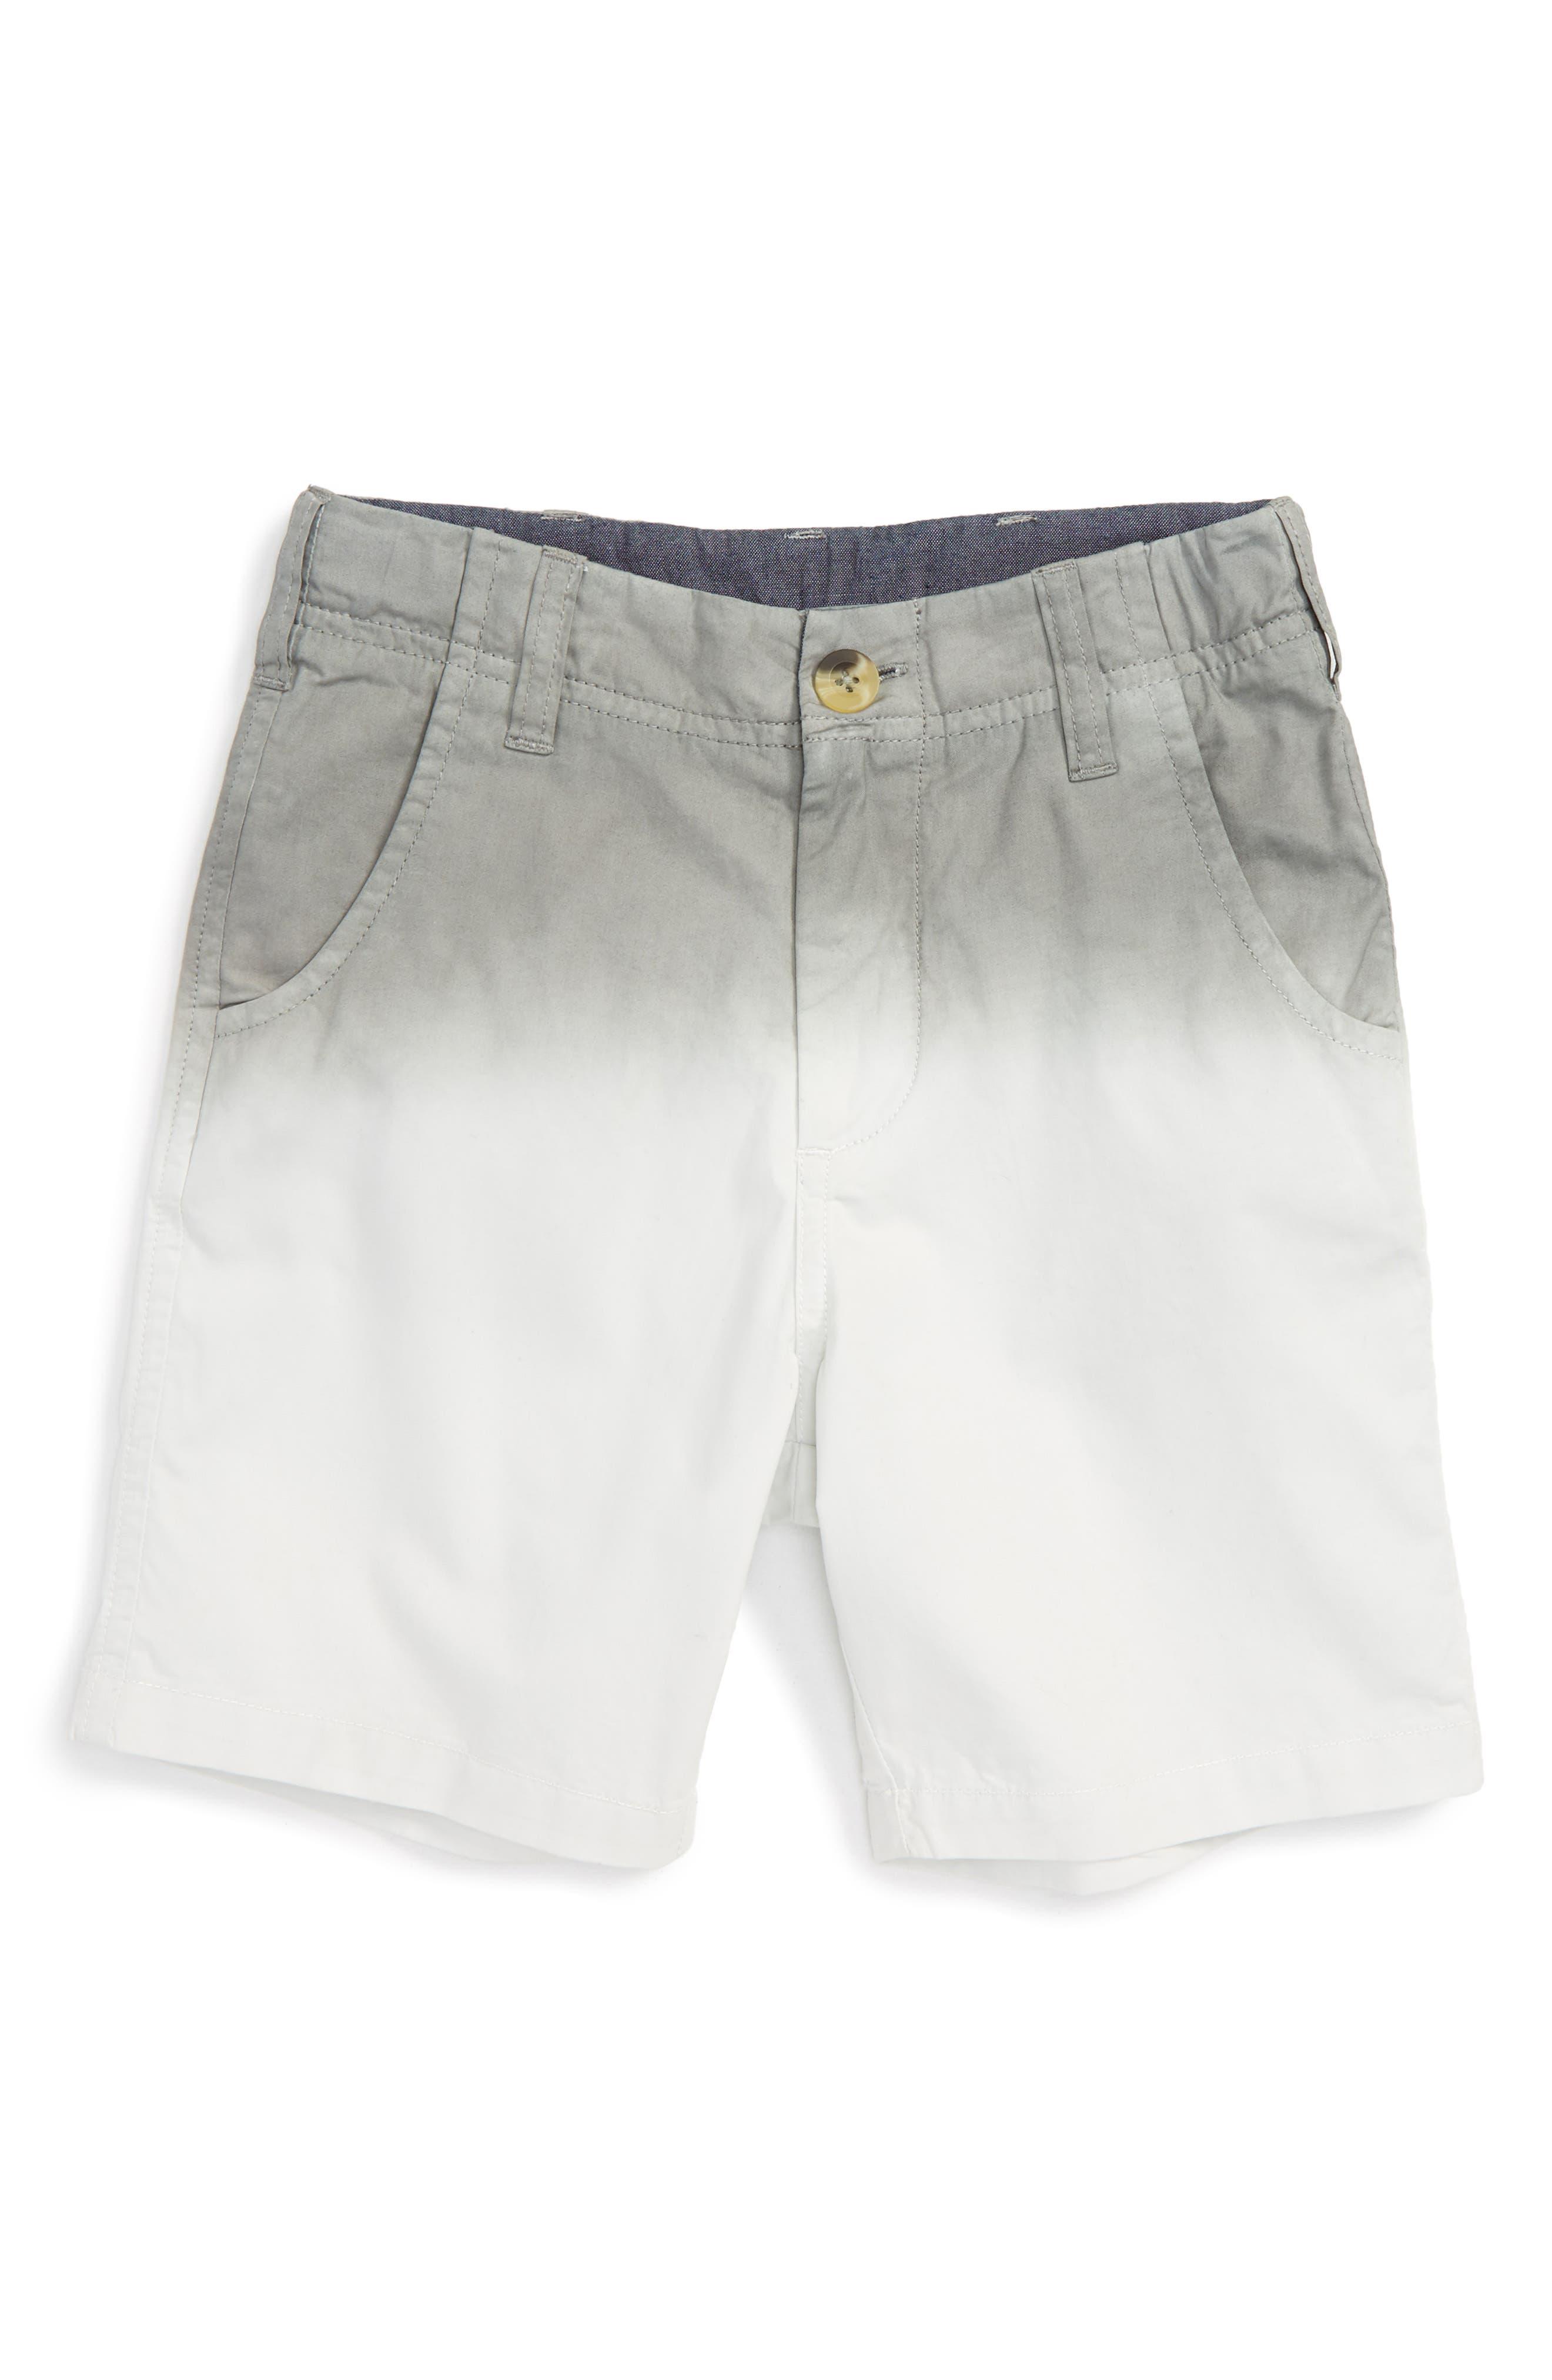 Peek Dip Dye Cotton Twill Shorts (Toddler Boys, Little Boys & Little Boys)